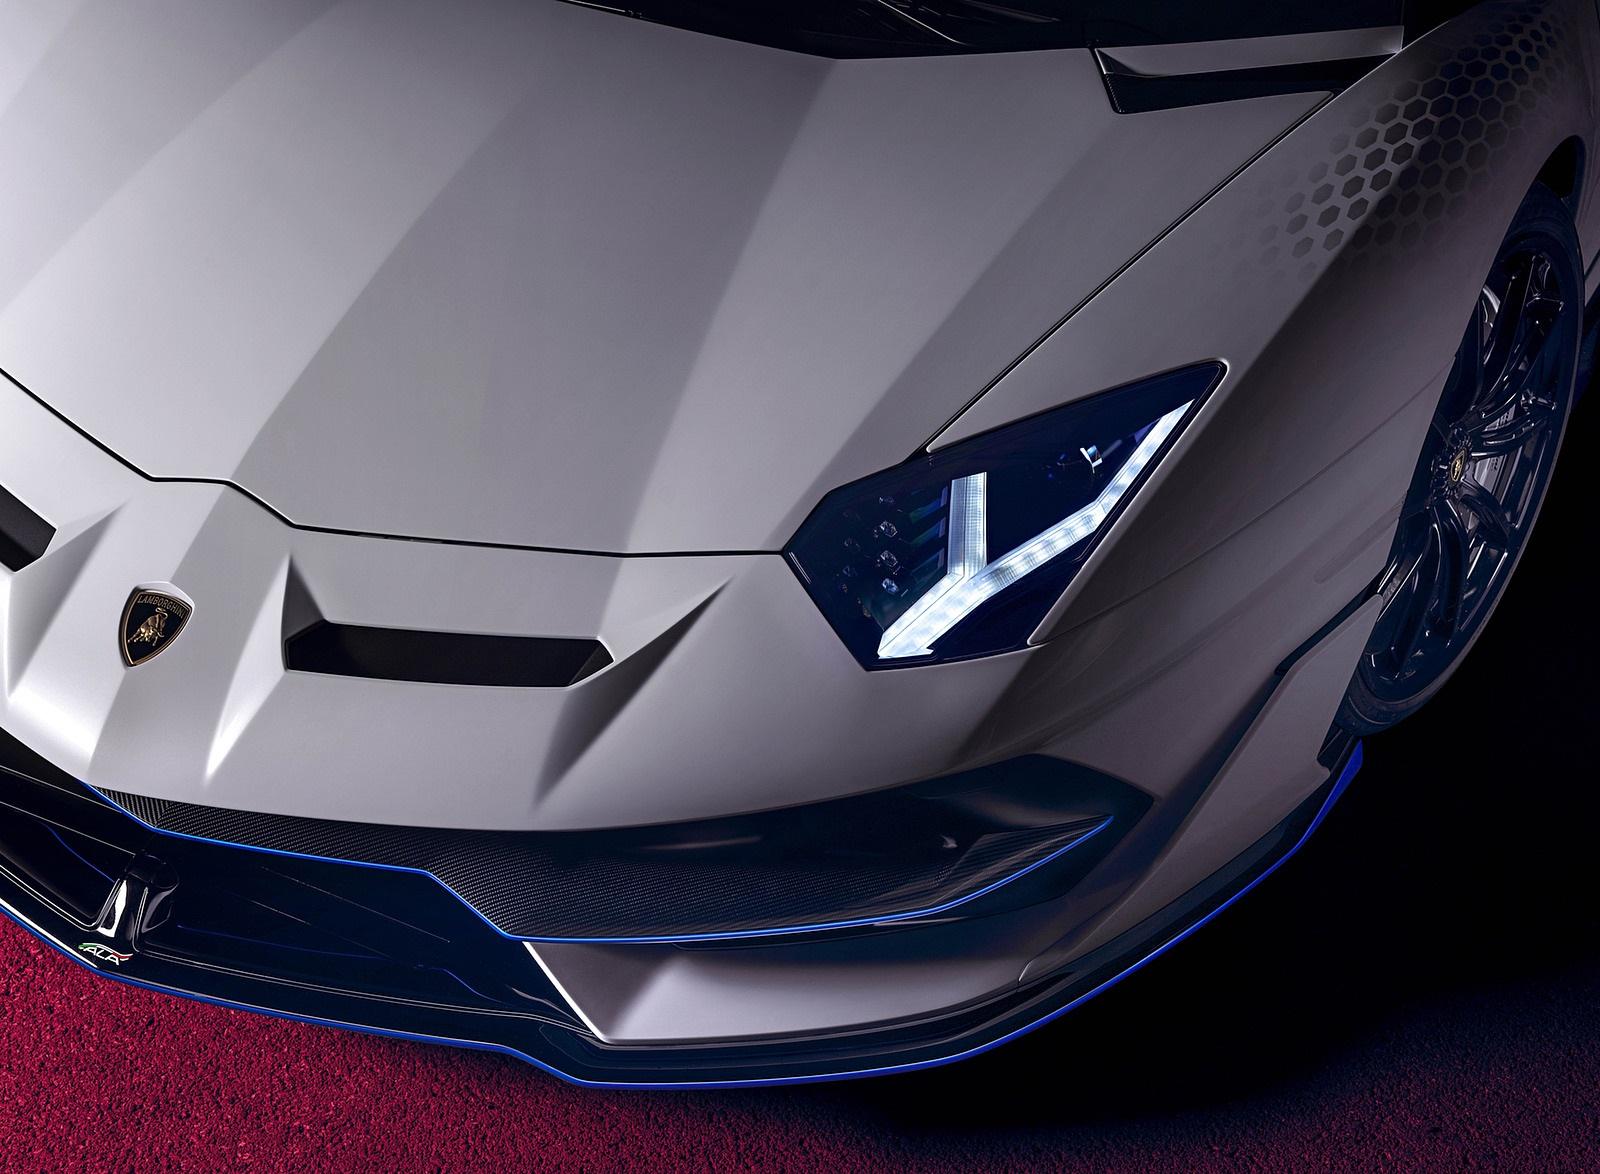 2020 Lamborghini Aventador SVJ Xago Edition Headlight Wallpapers (8)